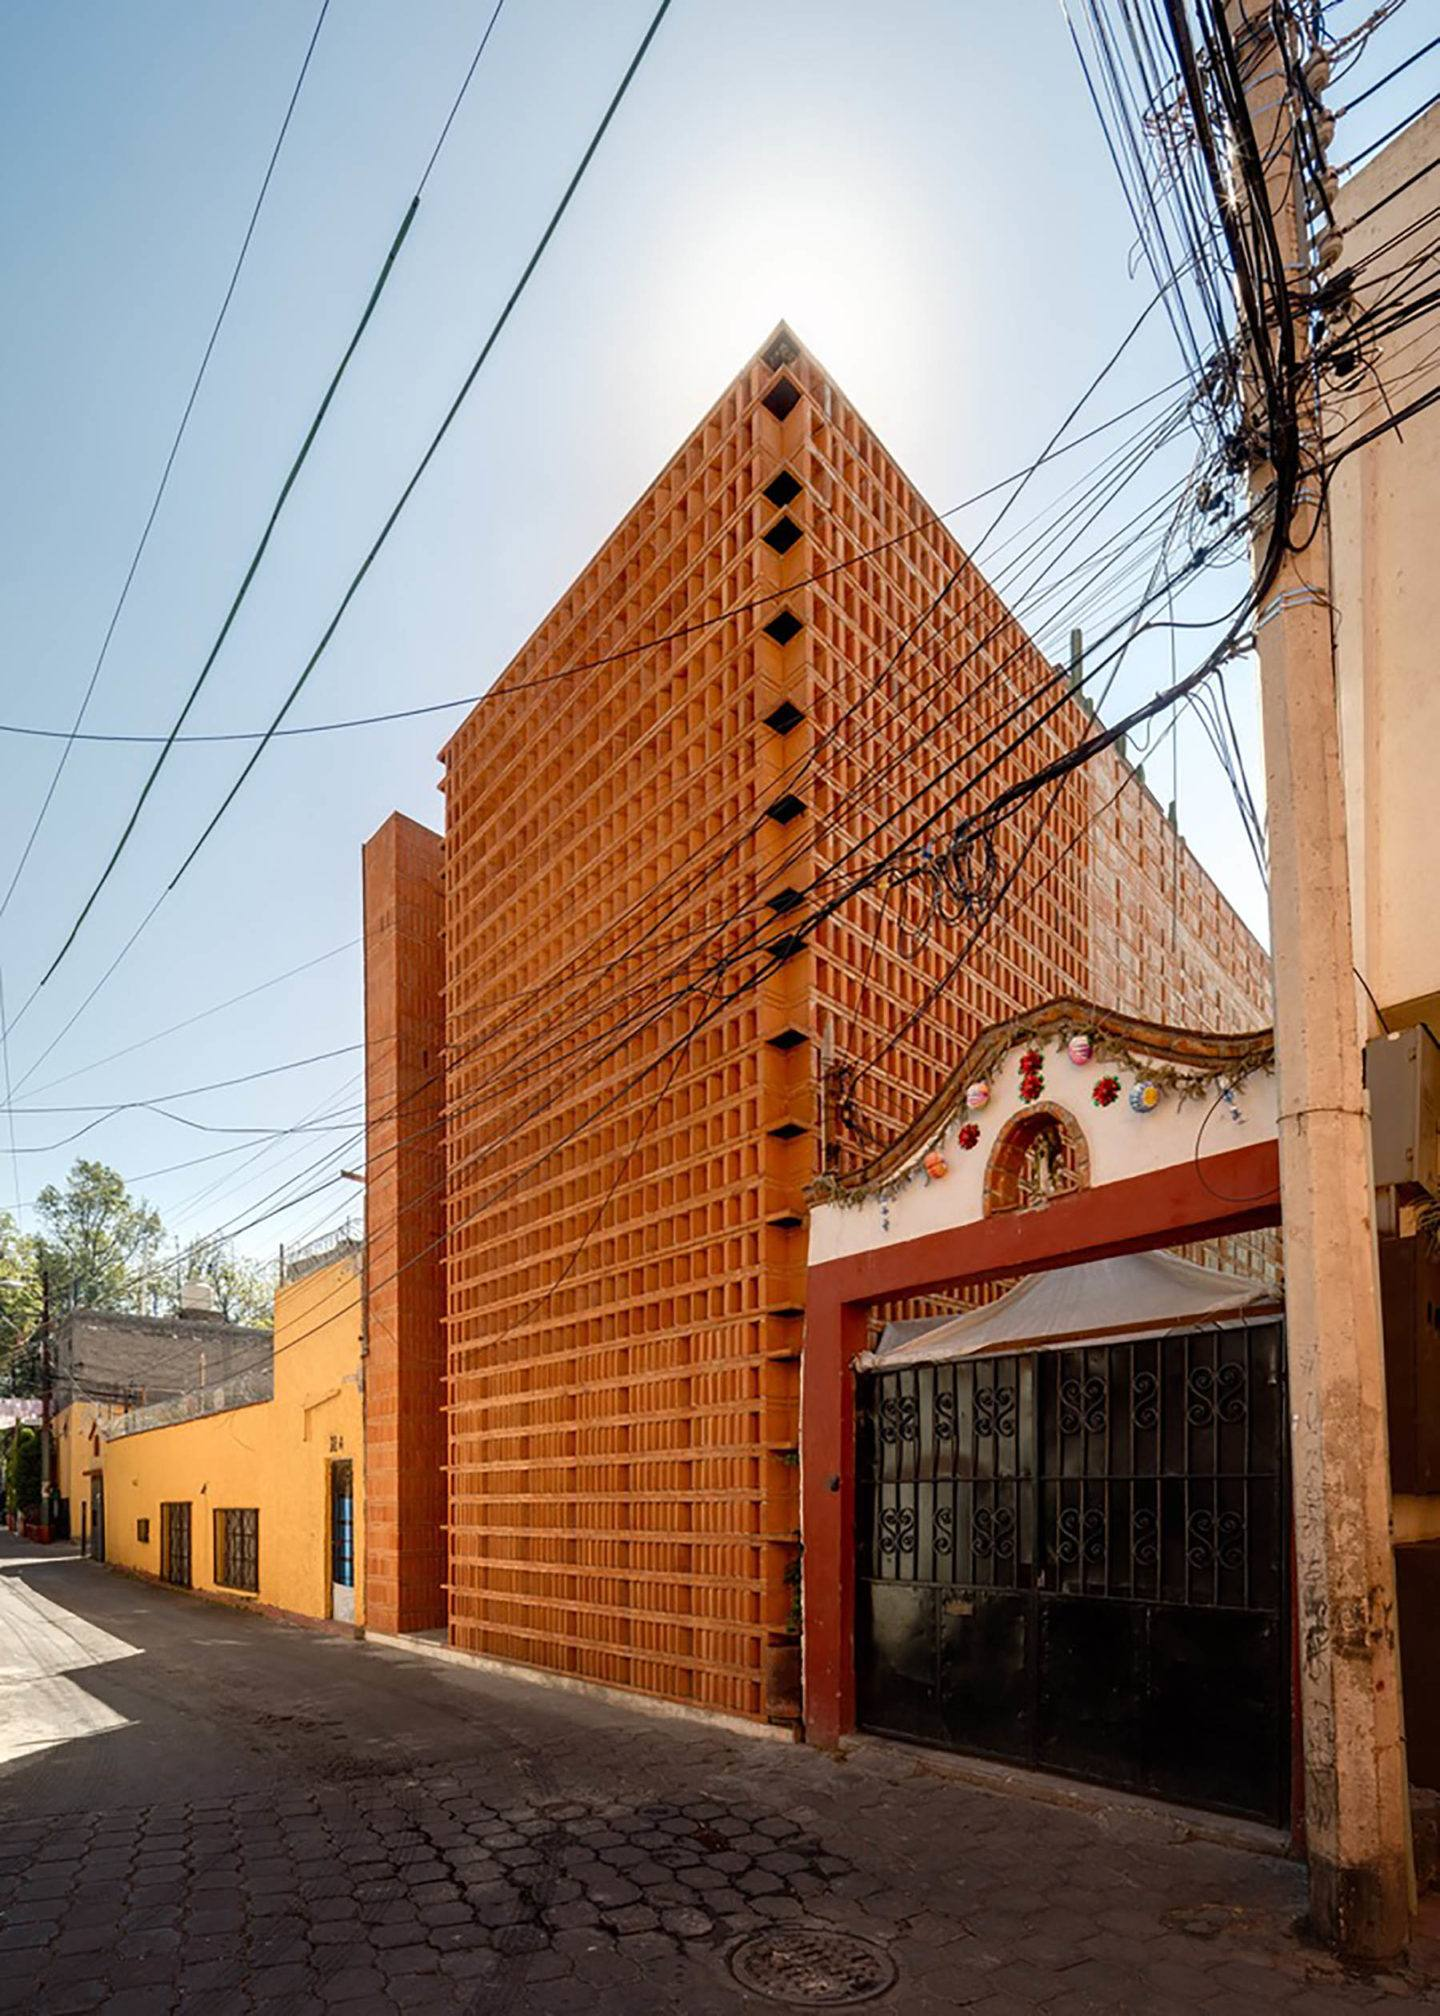 IGNANT-Architecture-Taller-De-Arquitectura-Mauricio-Rocha-Gabriela-Carrillo-Iturbide-Studio-4